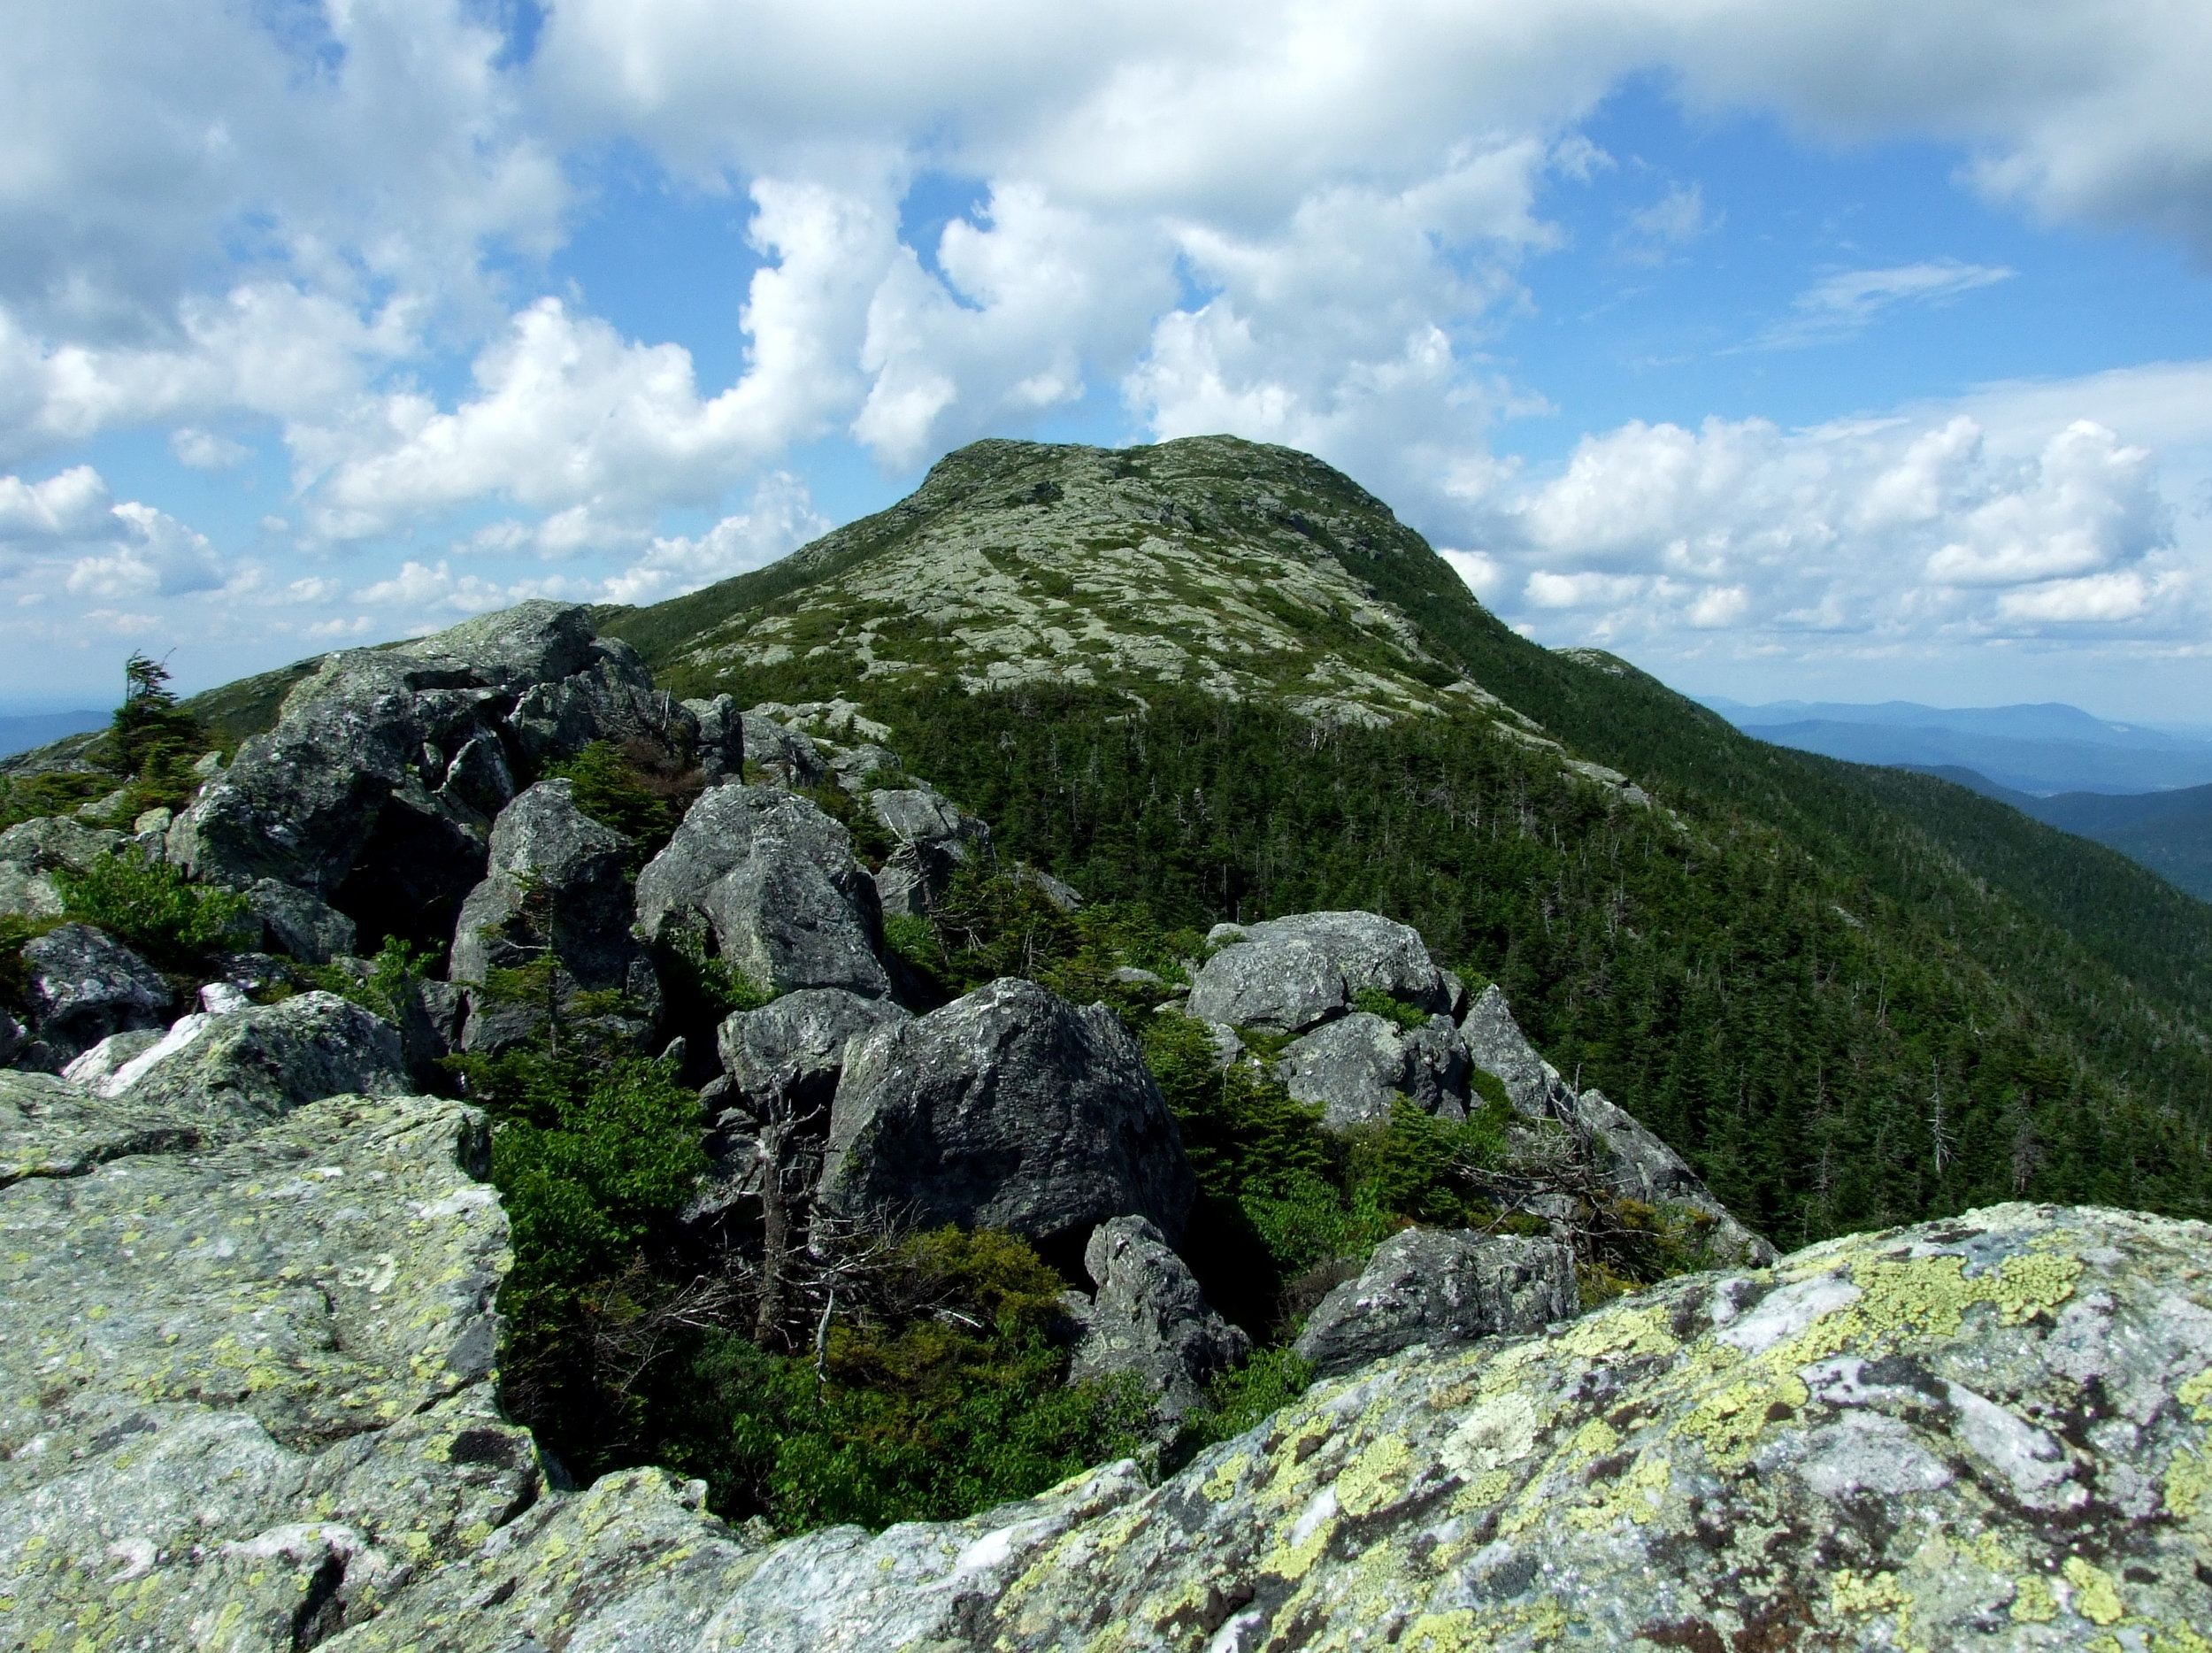 Mount Mansfield, Image Courtesy: SummitPost.org